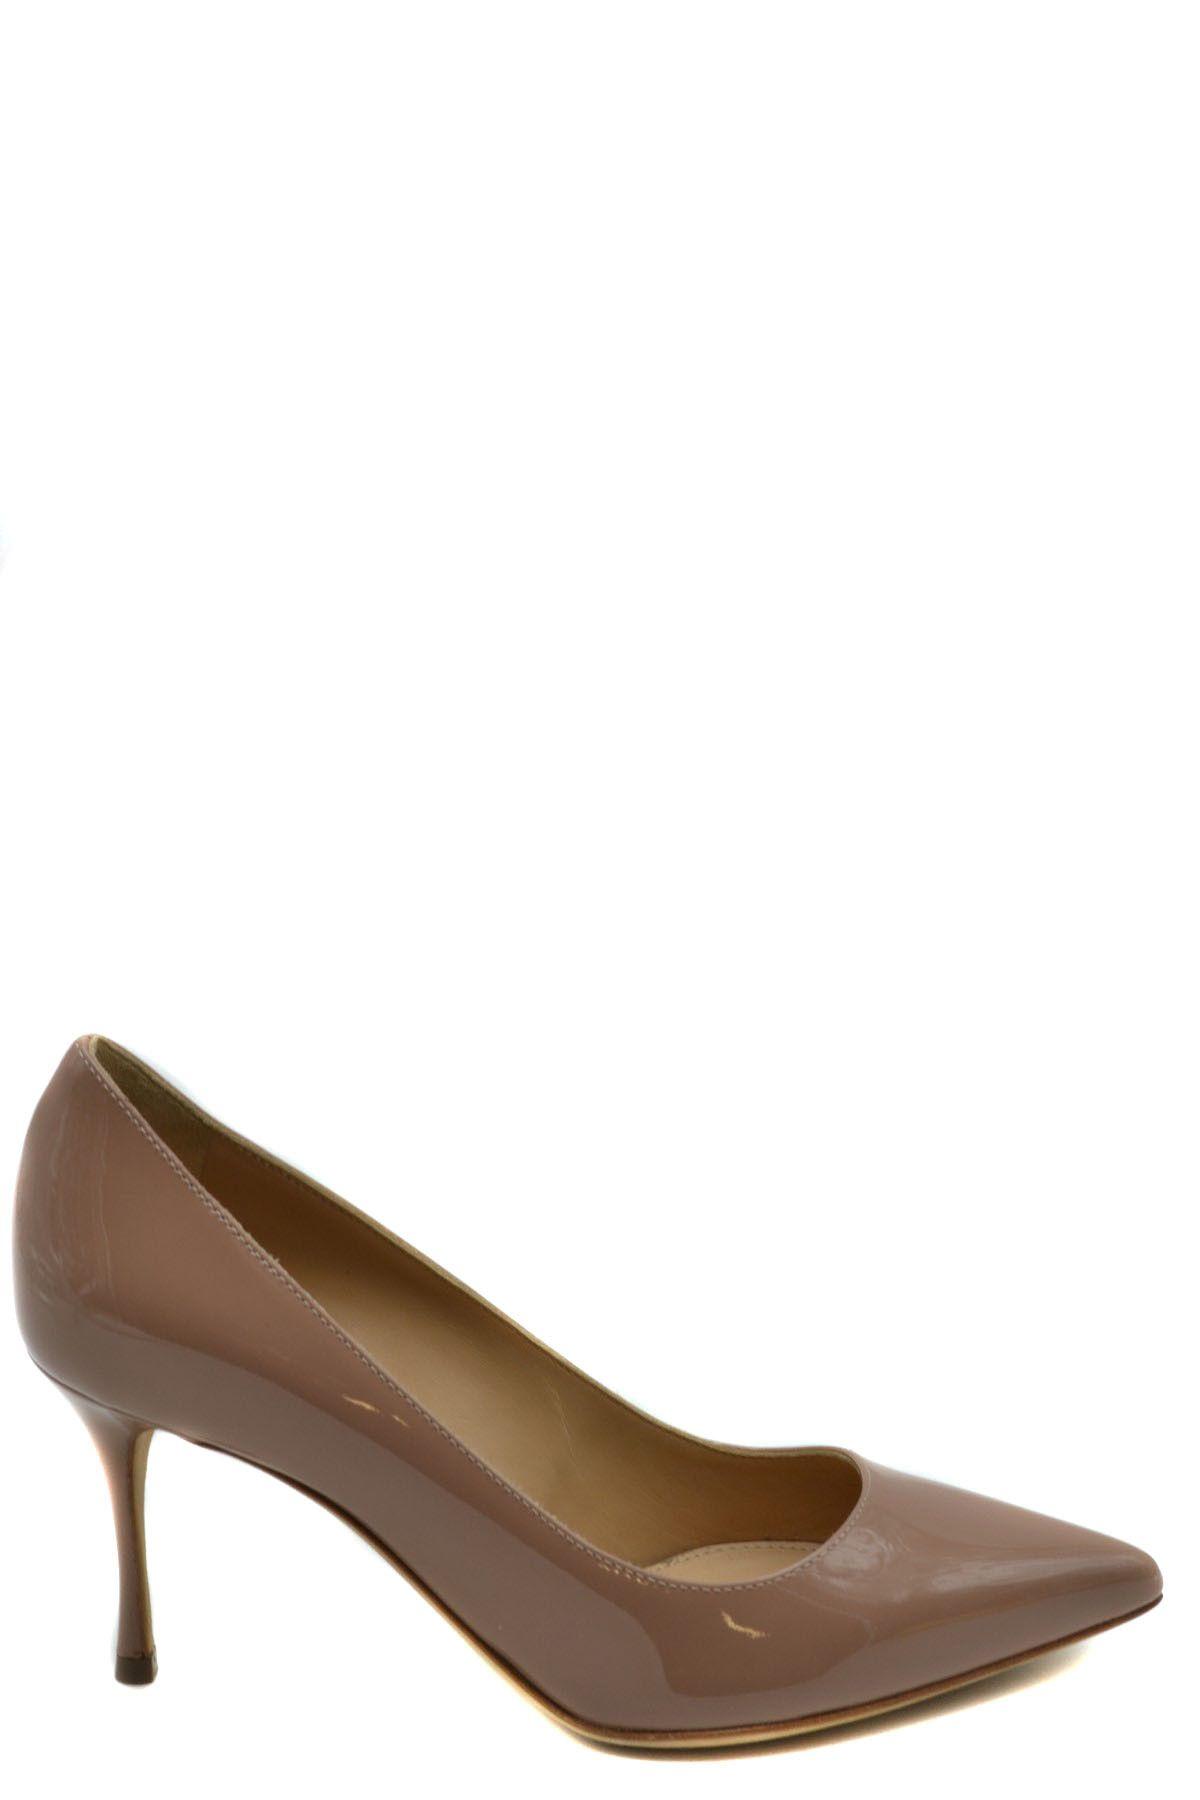 Sergio Rossi Women's Pumps Shoes In Beige